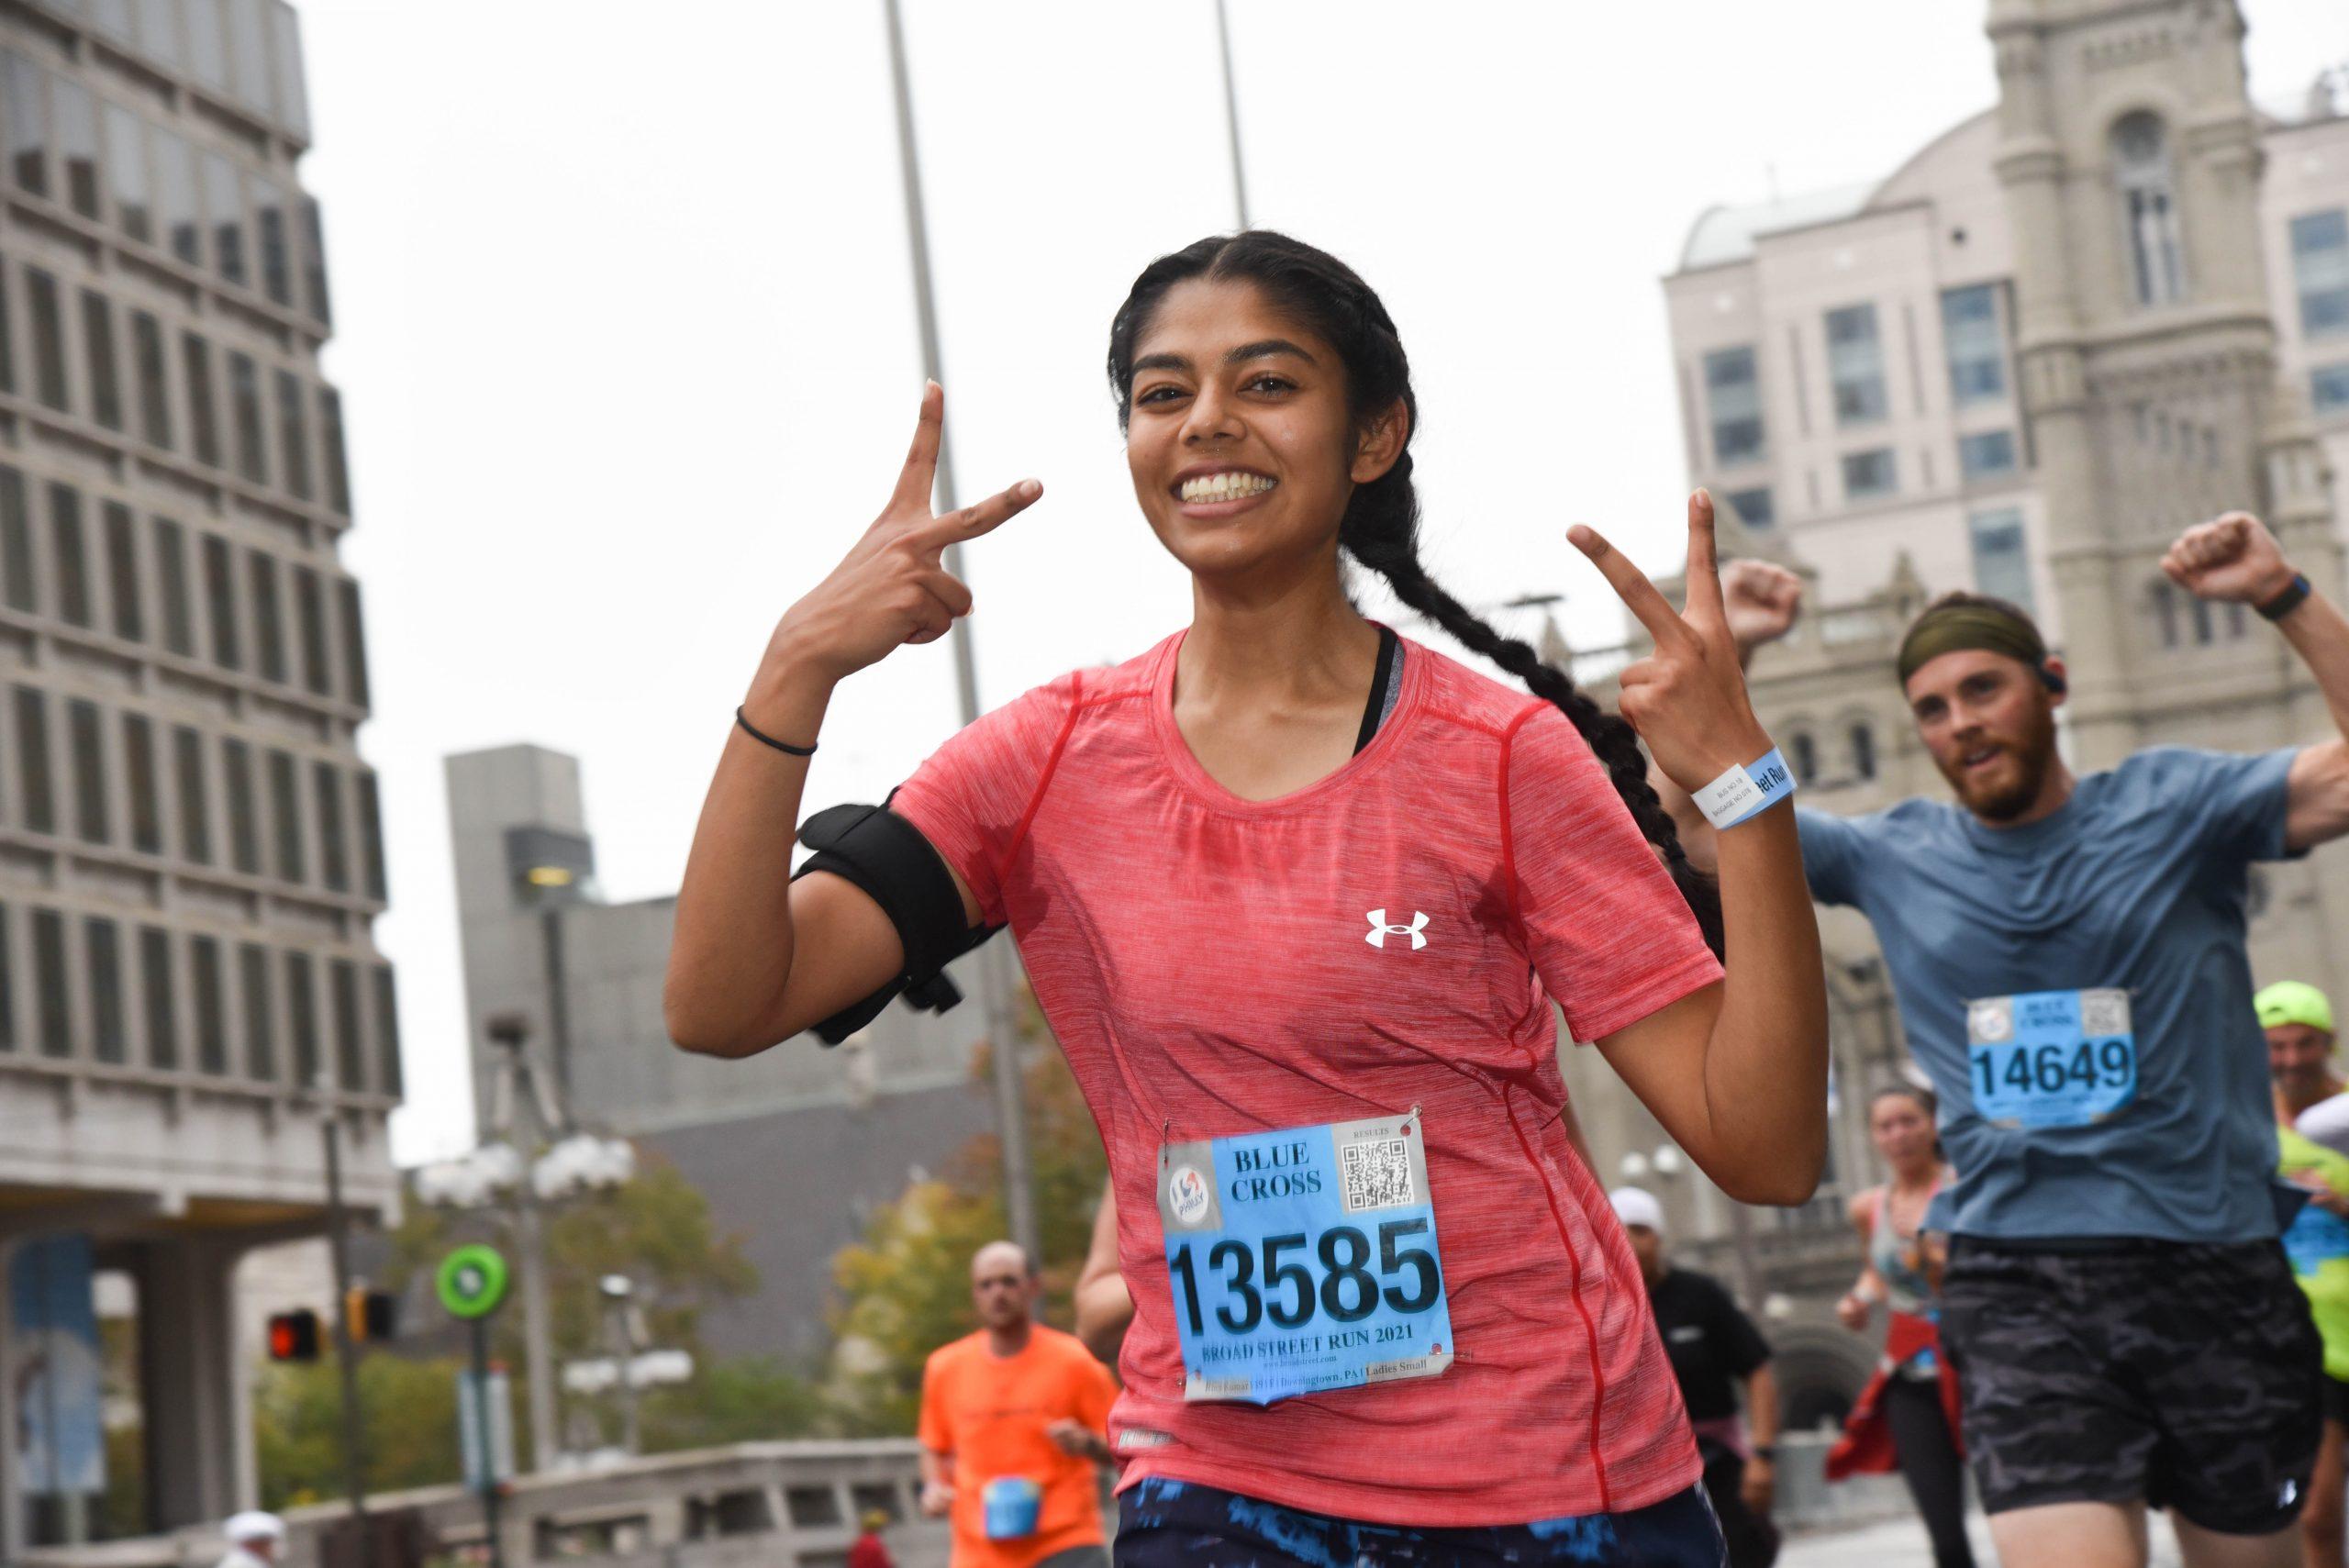 Photo of runners at 2021 Blue Cross Broad Street Run